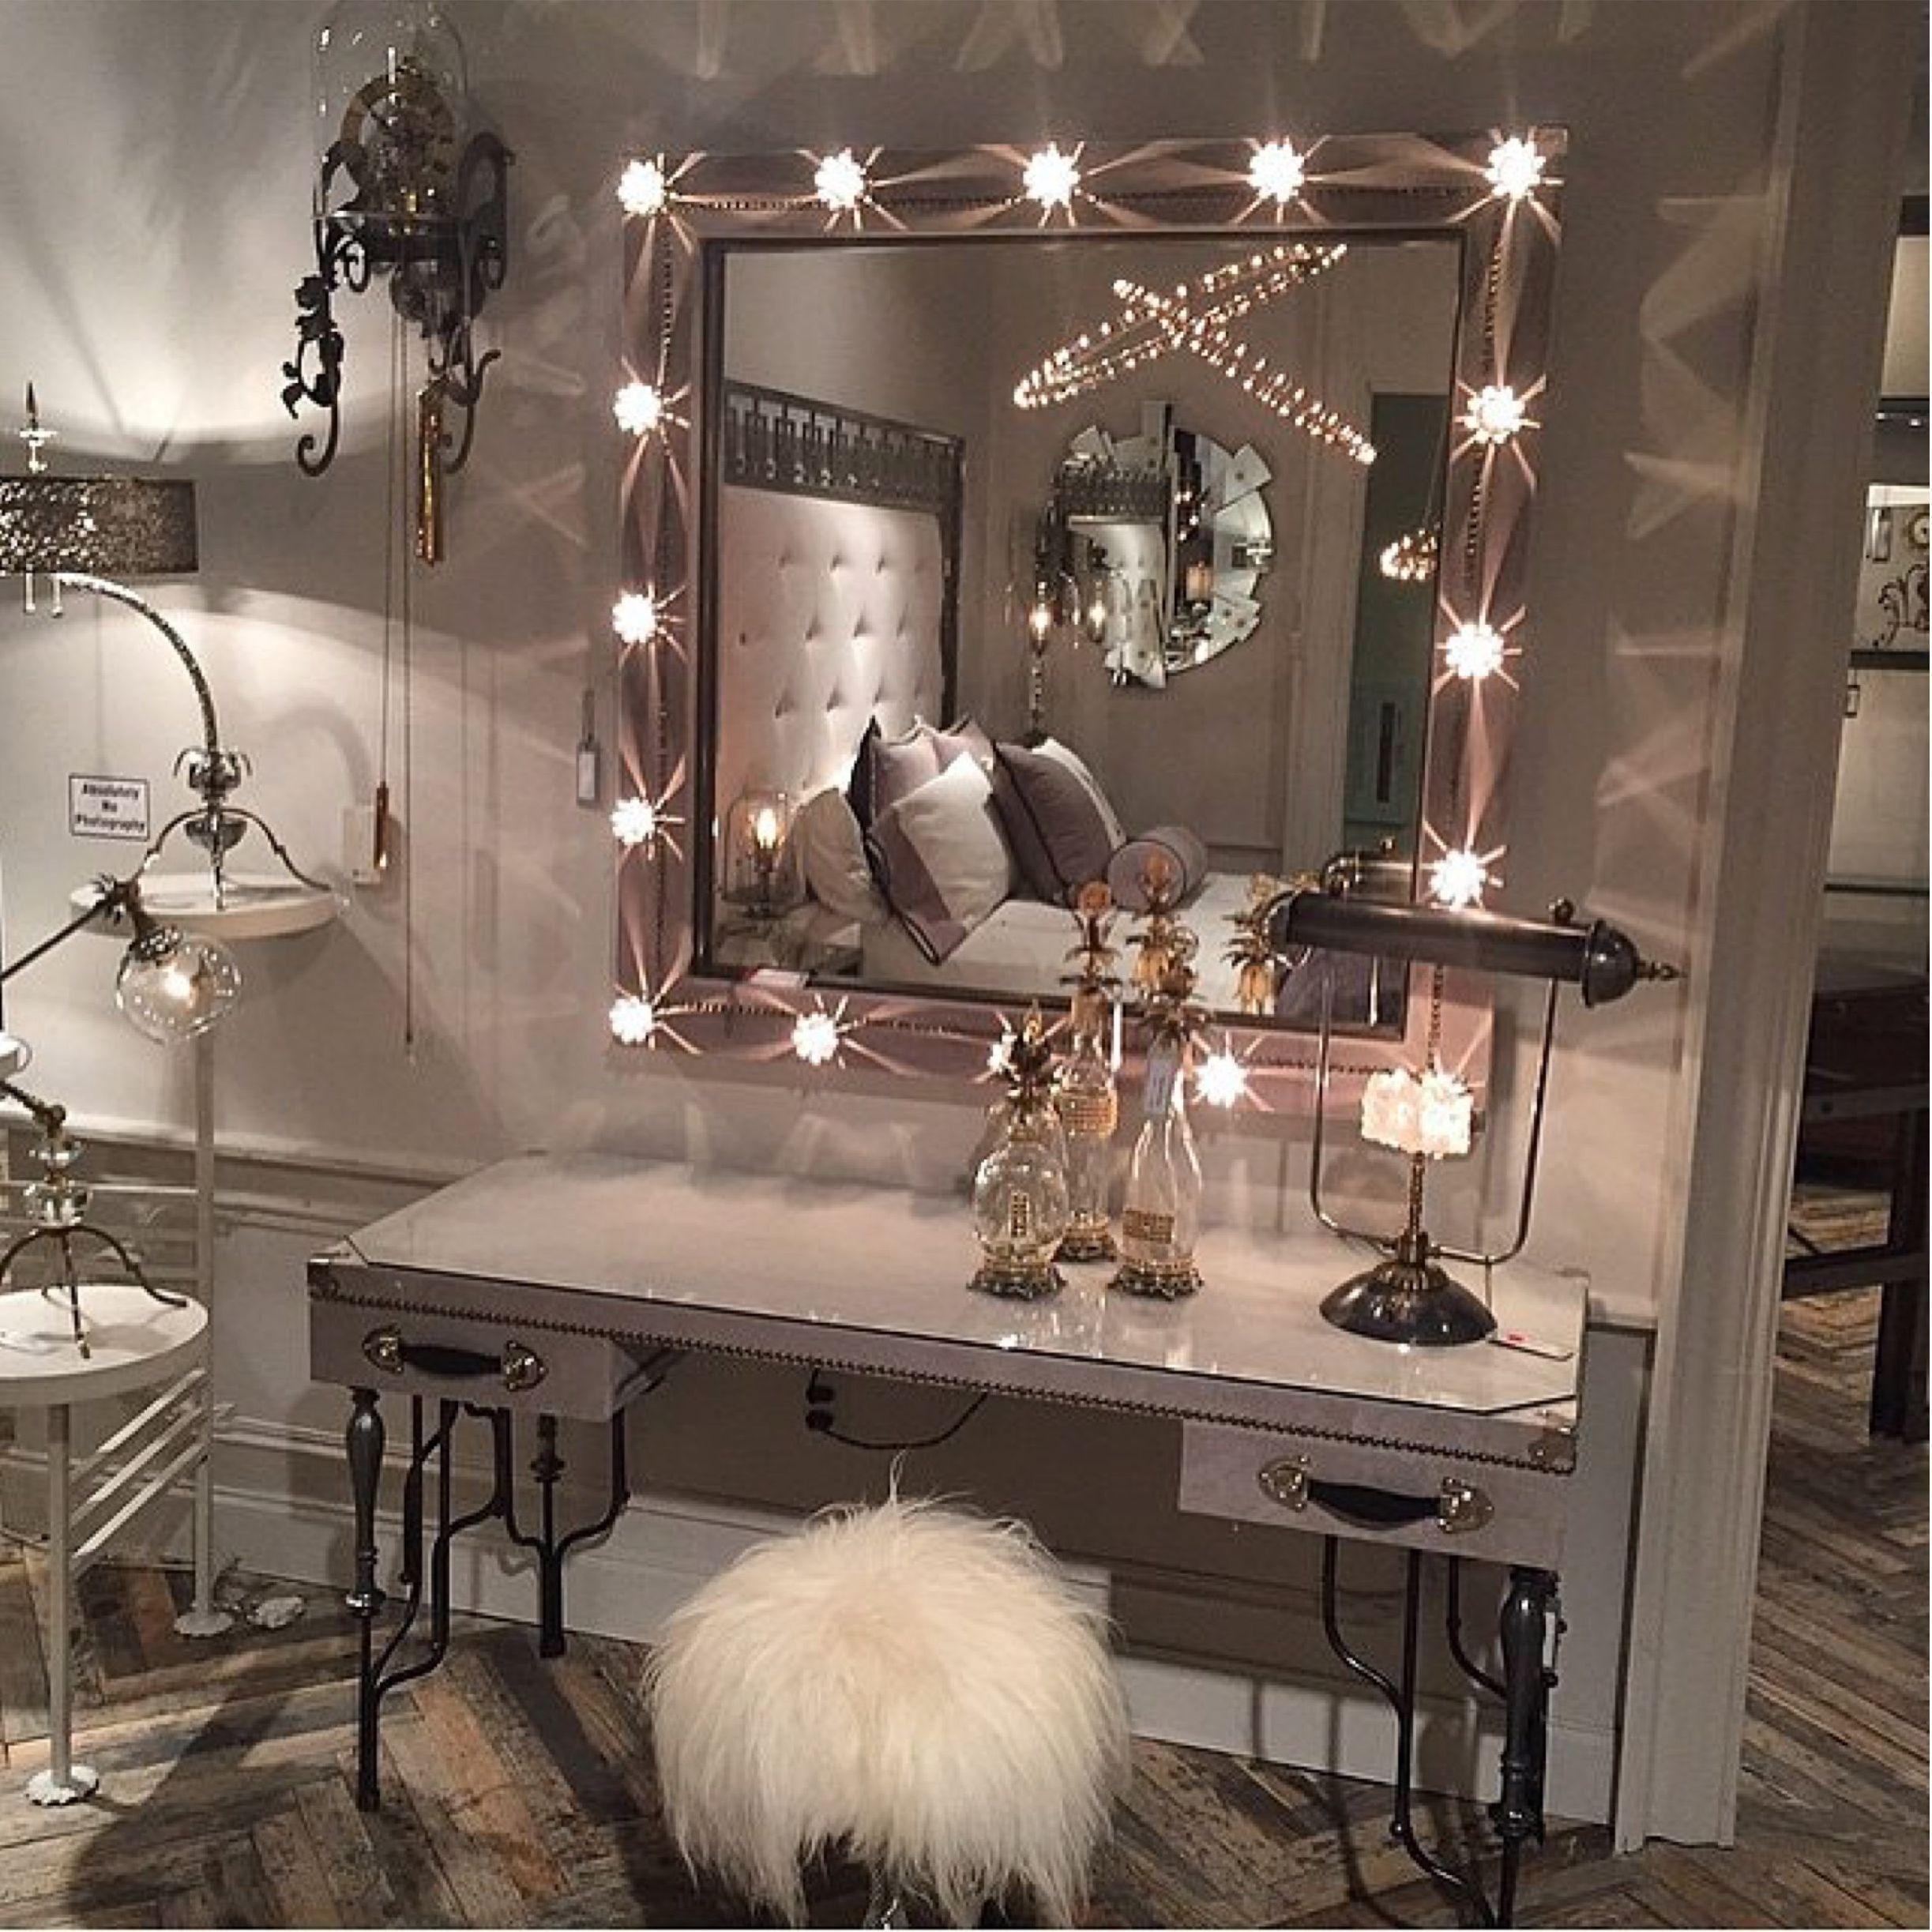 Schone Vanity Makeup Table Ideen Fur Inspiration Futuriandesign Beautifu Beautifu Fur Fu In 2020 Schminktisch Stilvolles Schlafzimmer Schlafzimmer Spiegel